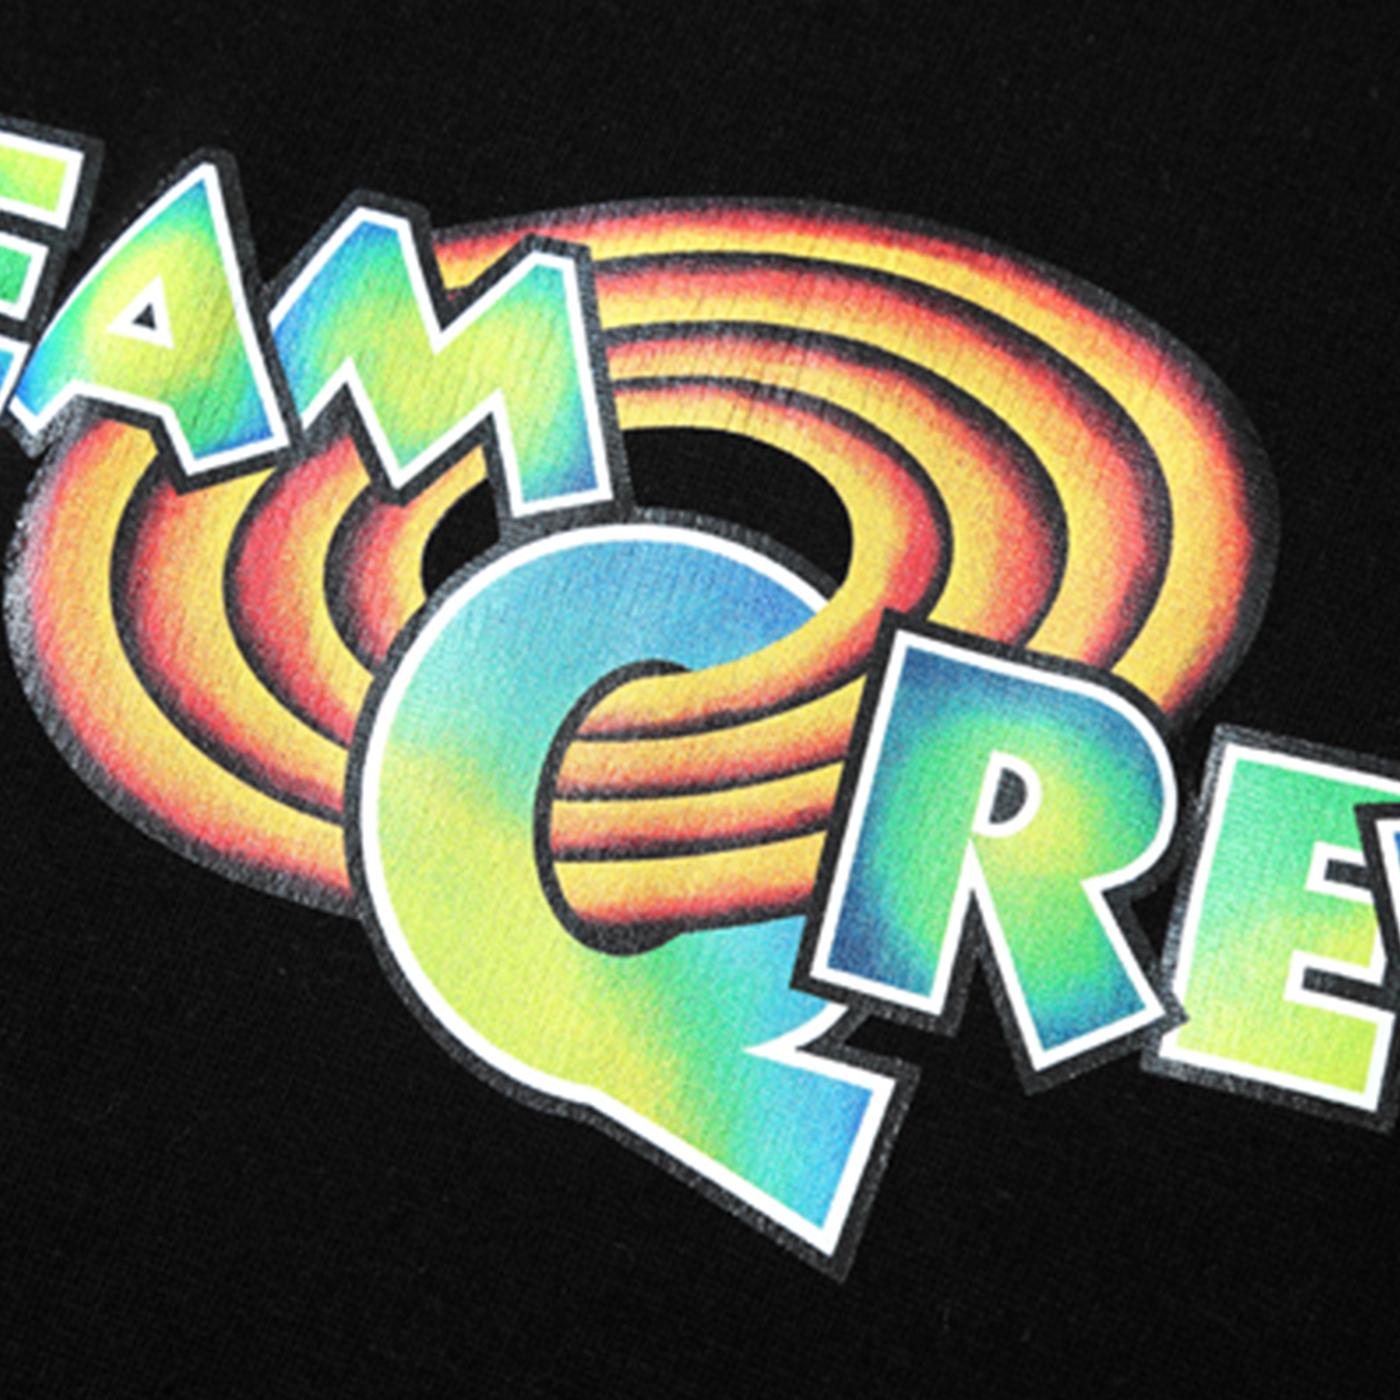 a71df6066f78dc SPACE JAM SPOOF DREAM CREW HOODIES IN BLACK · STORE CAT CAT · Online ...